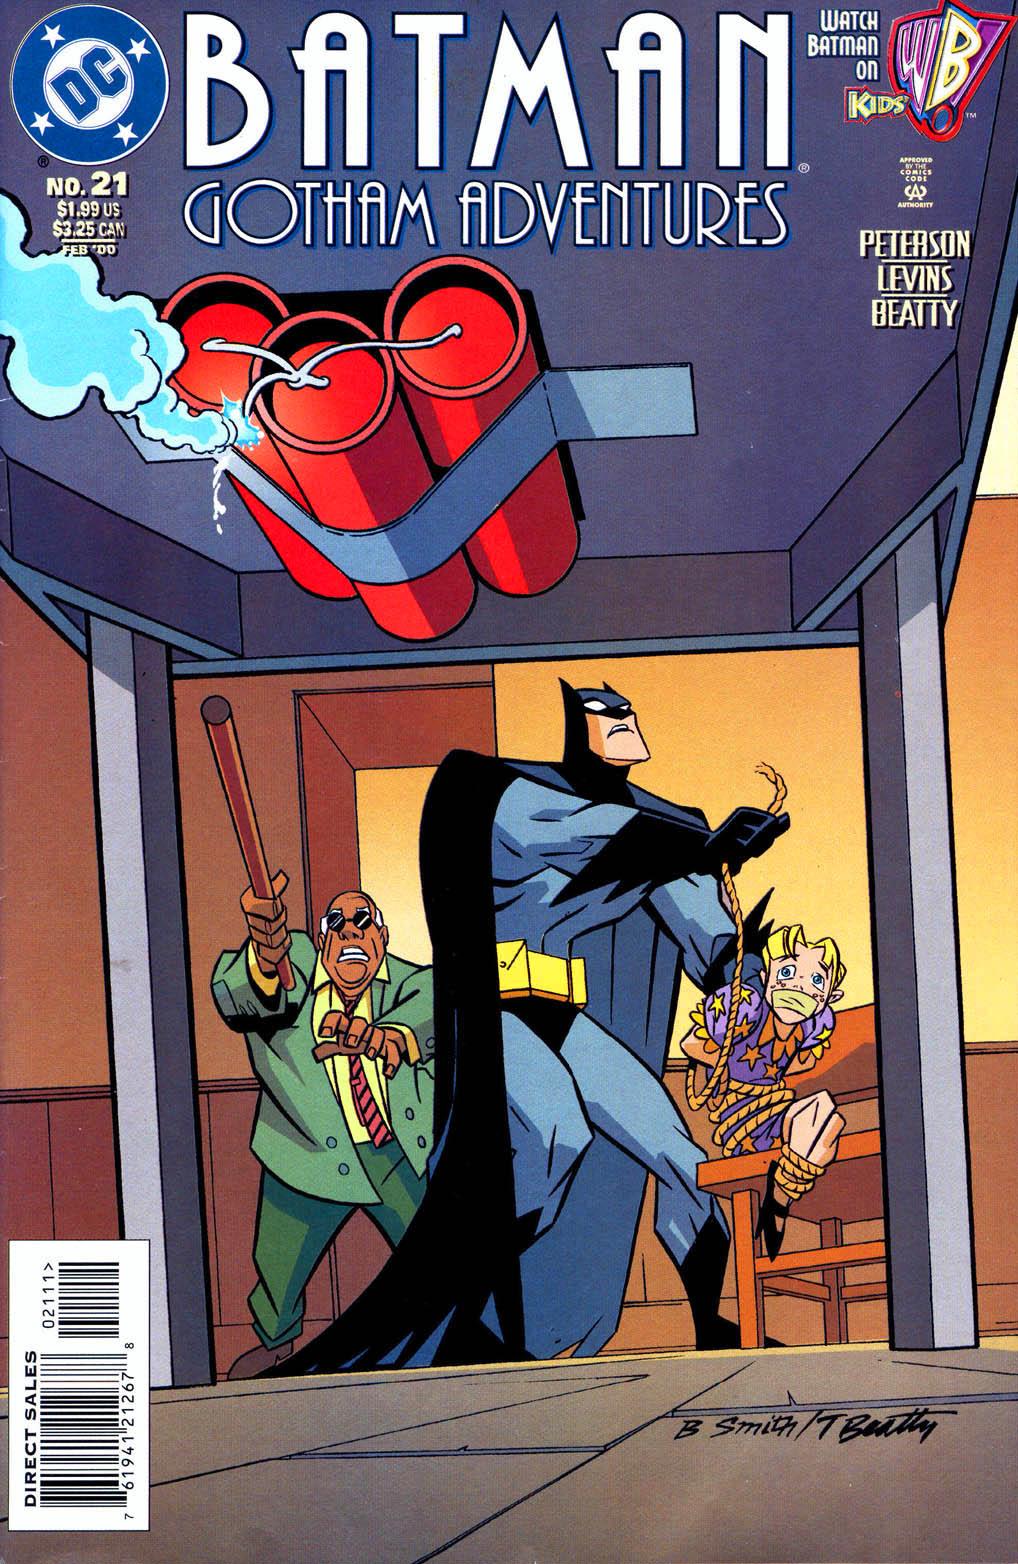 Batman: Gotham Adventures 21 Page 1